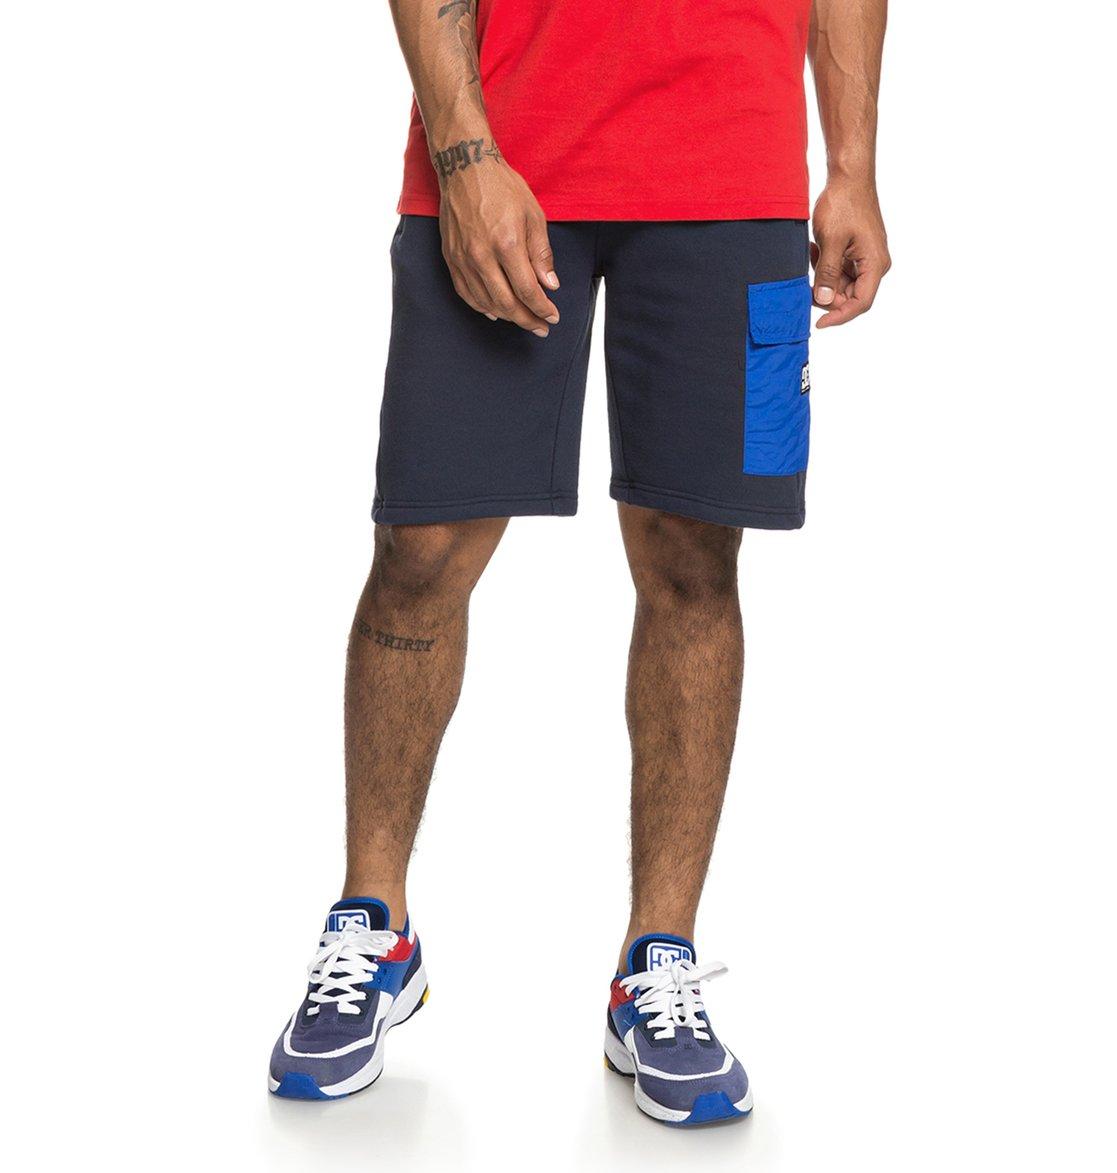 d8e91f79 0 Simmons - Sweat Shorts for Men Blue EDYFB03057 DC Shoes